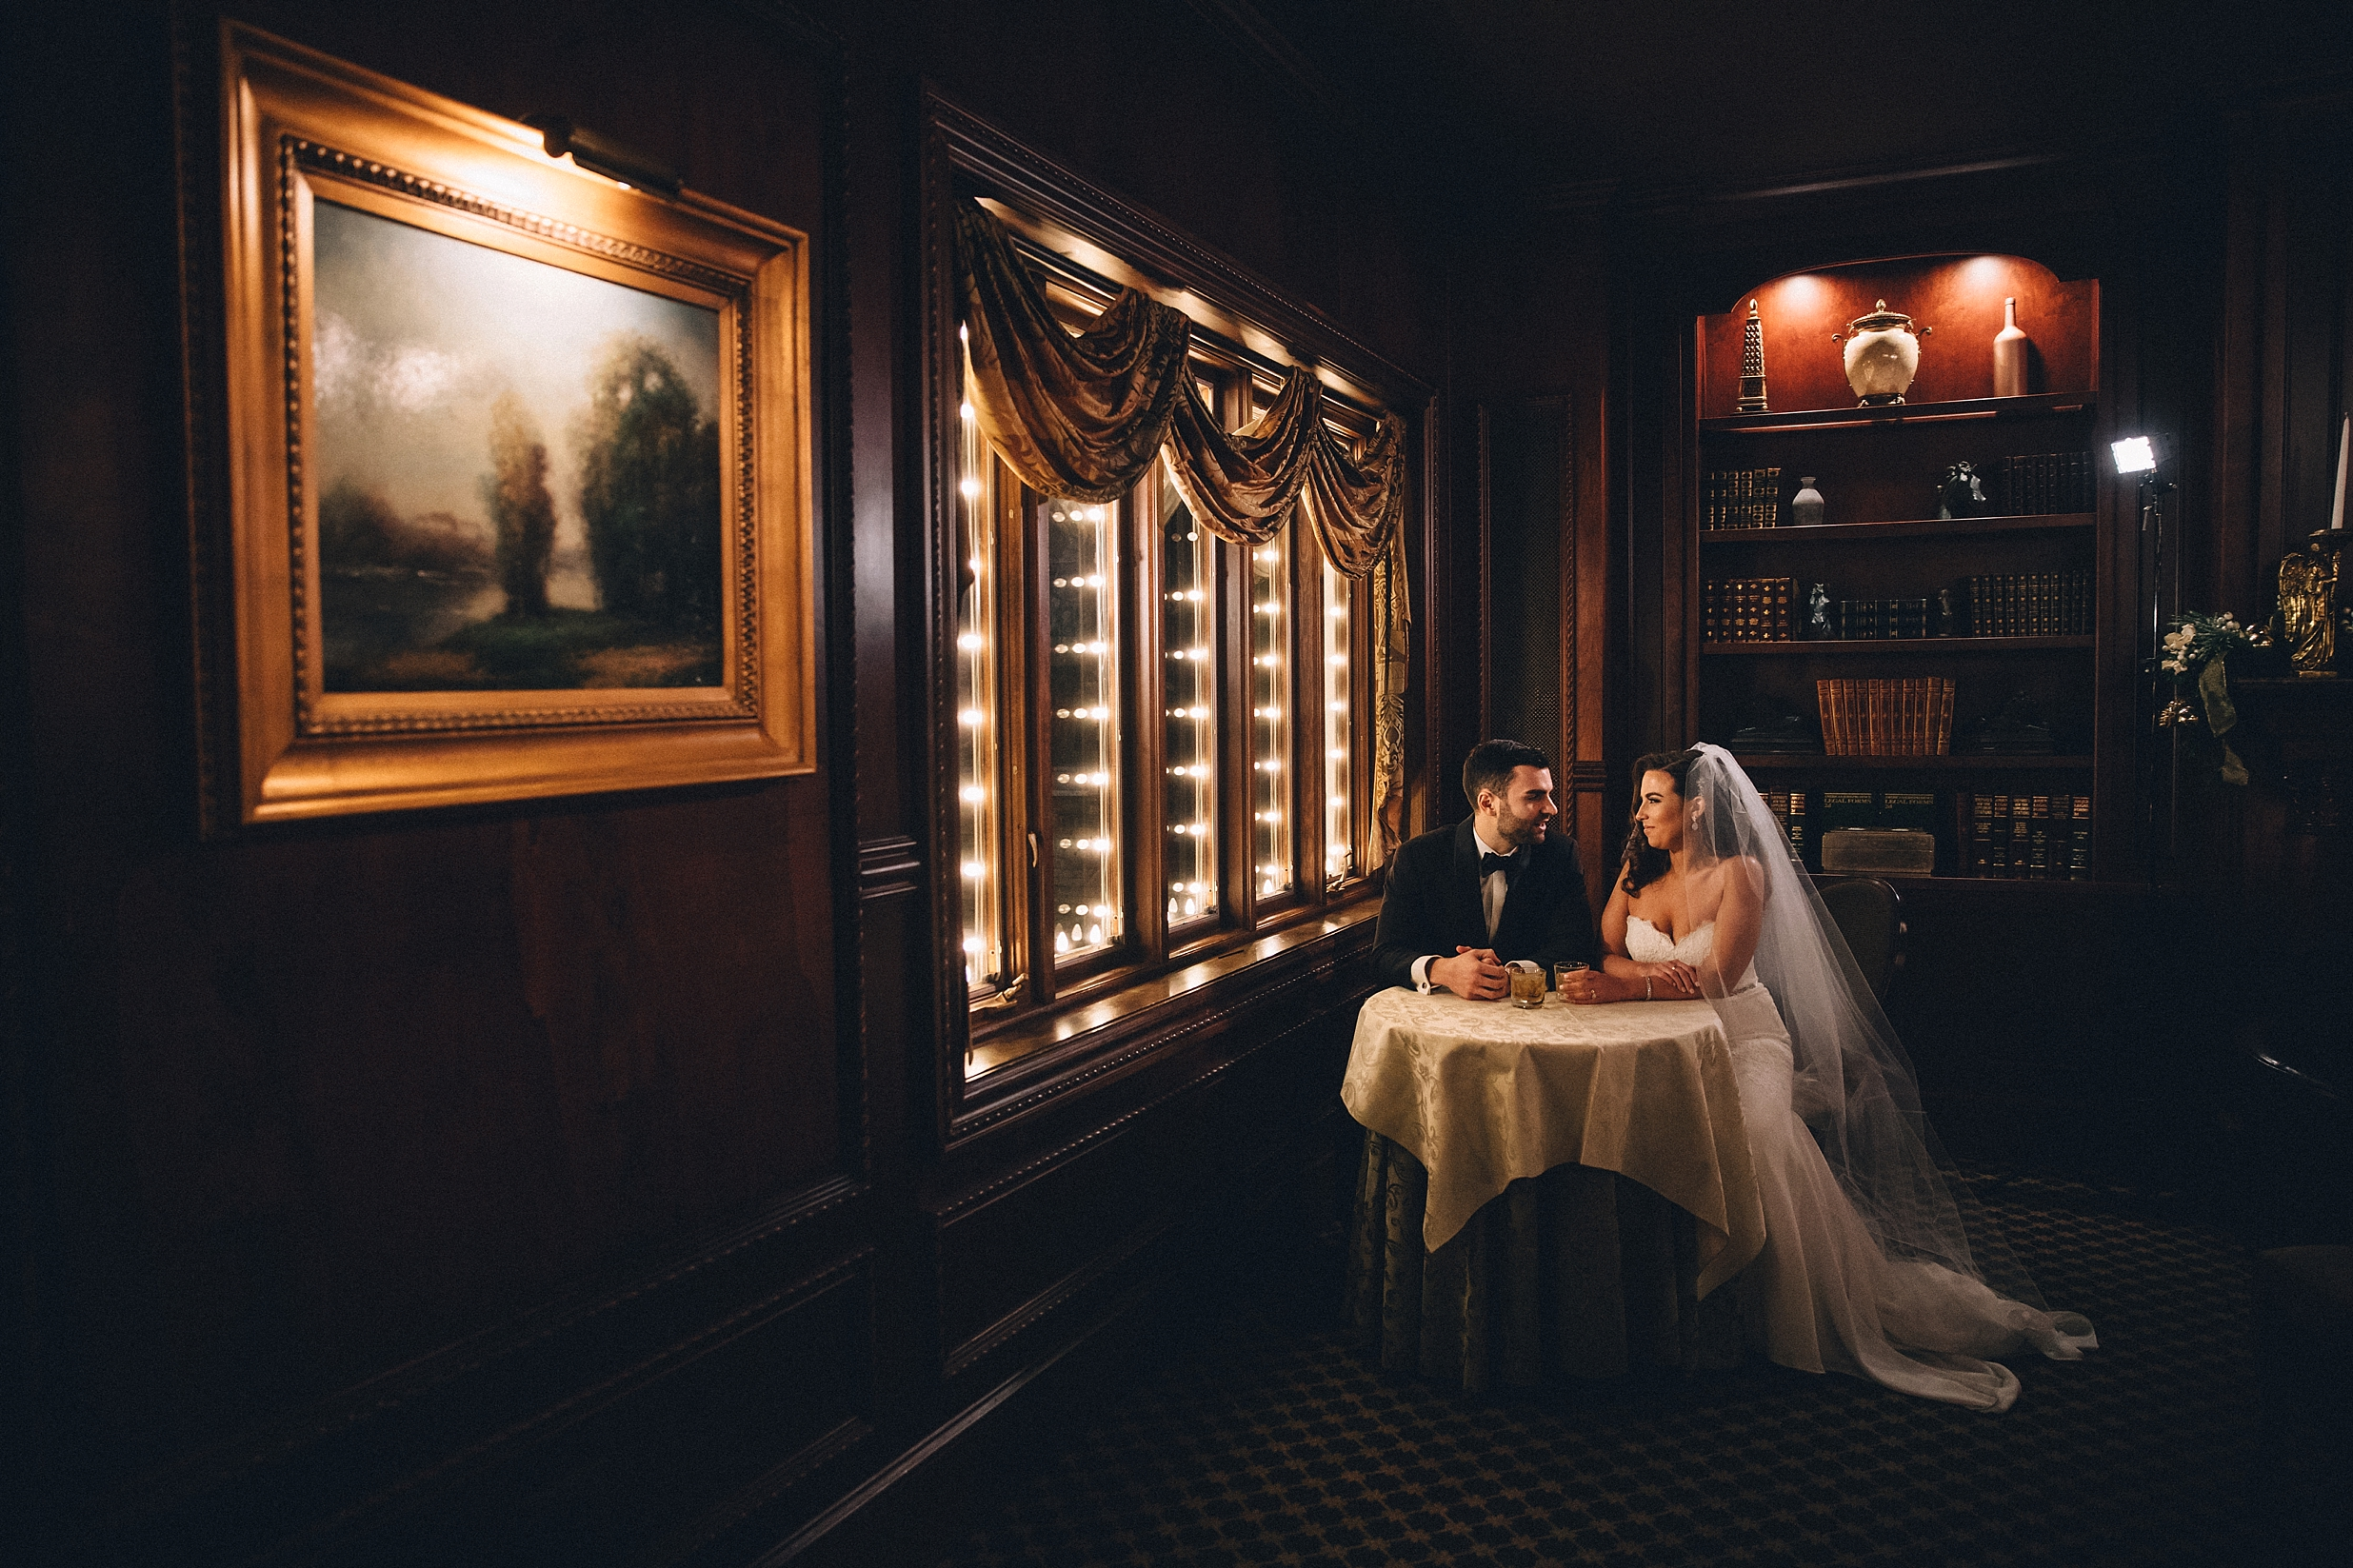 winter-wedding-snow-indoor-ceremony-nj-photographer_0023.jpg